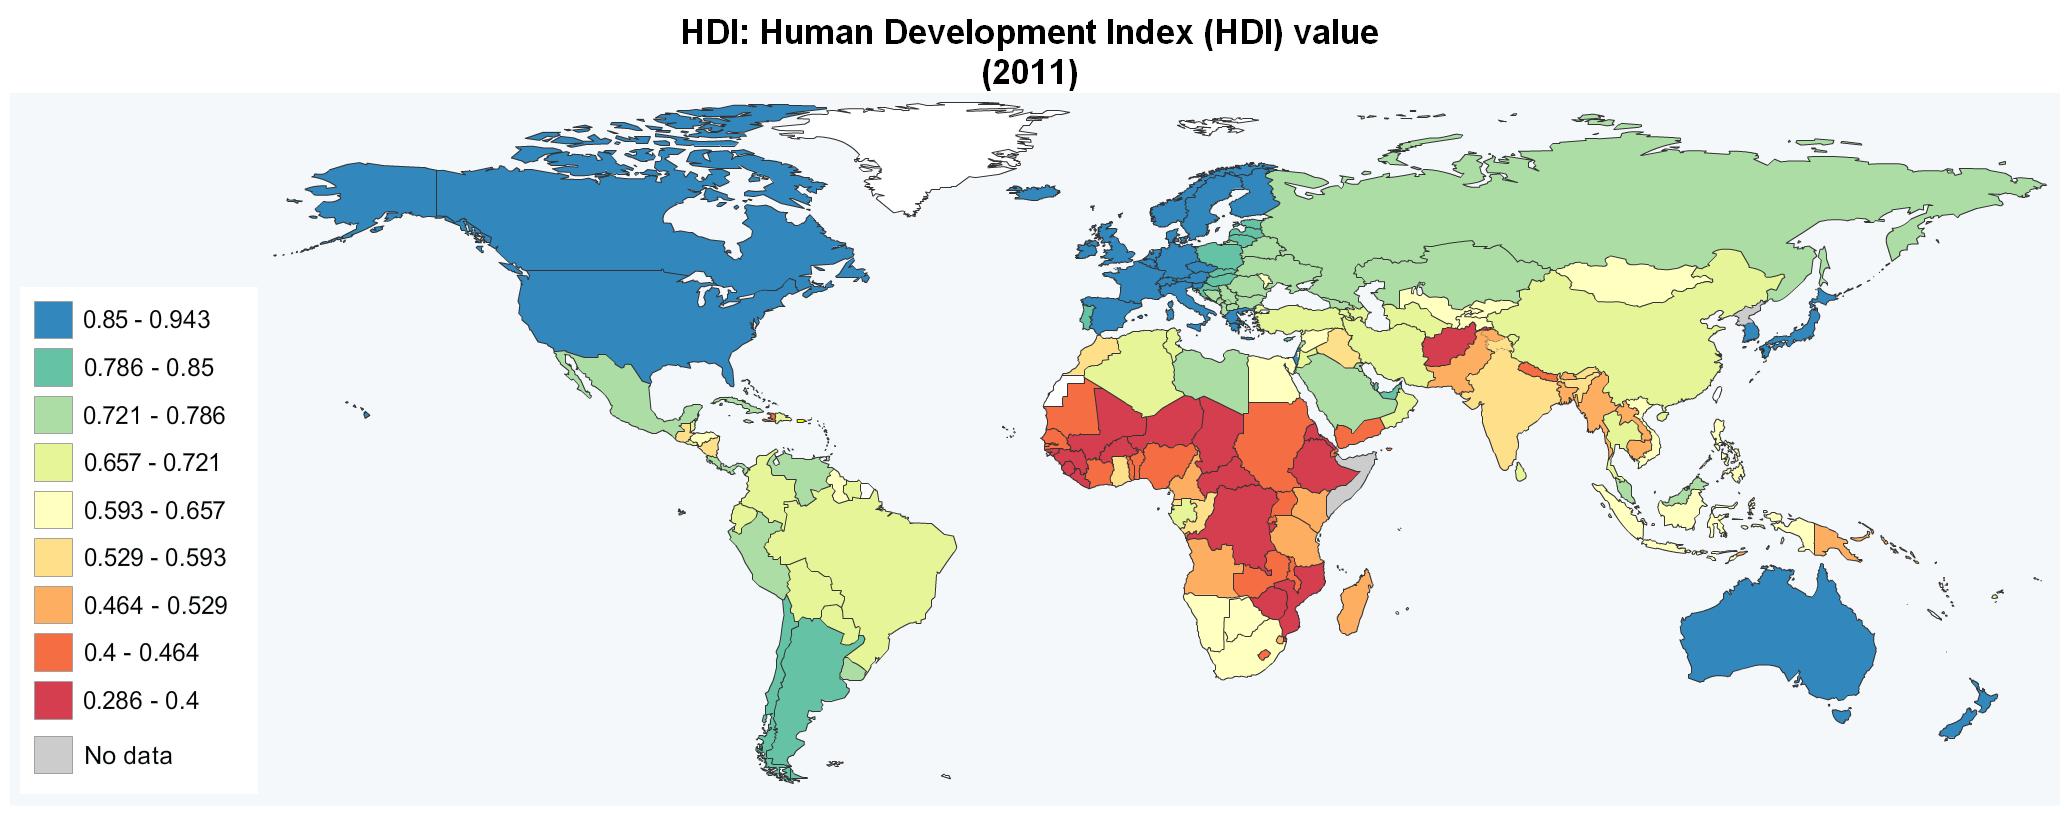 Arab Human Development Reports (AHDR) - United Nations Development Programme